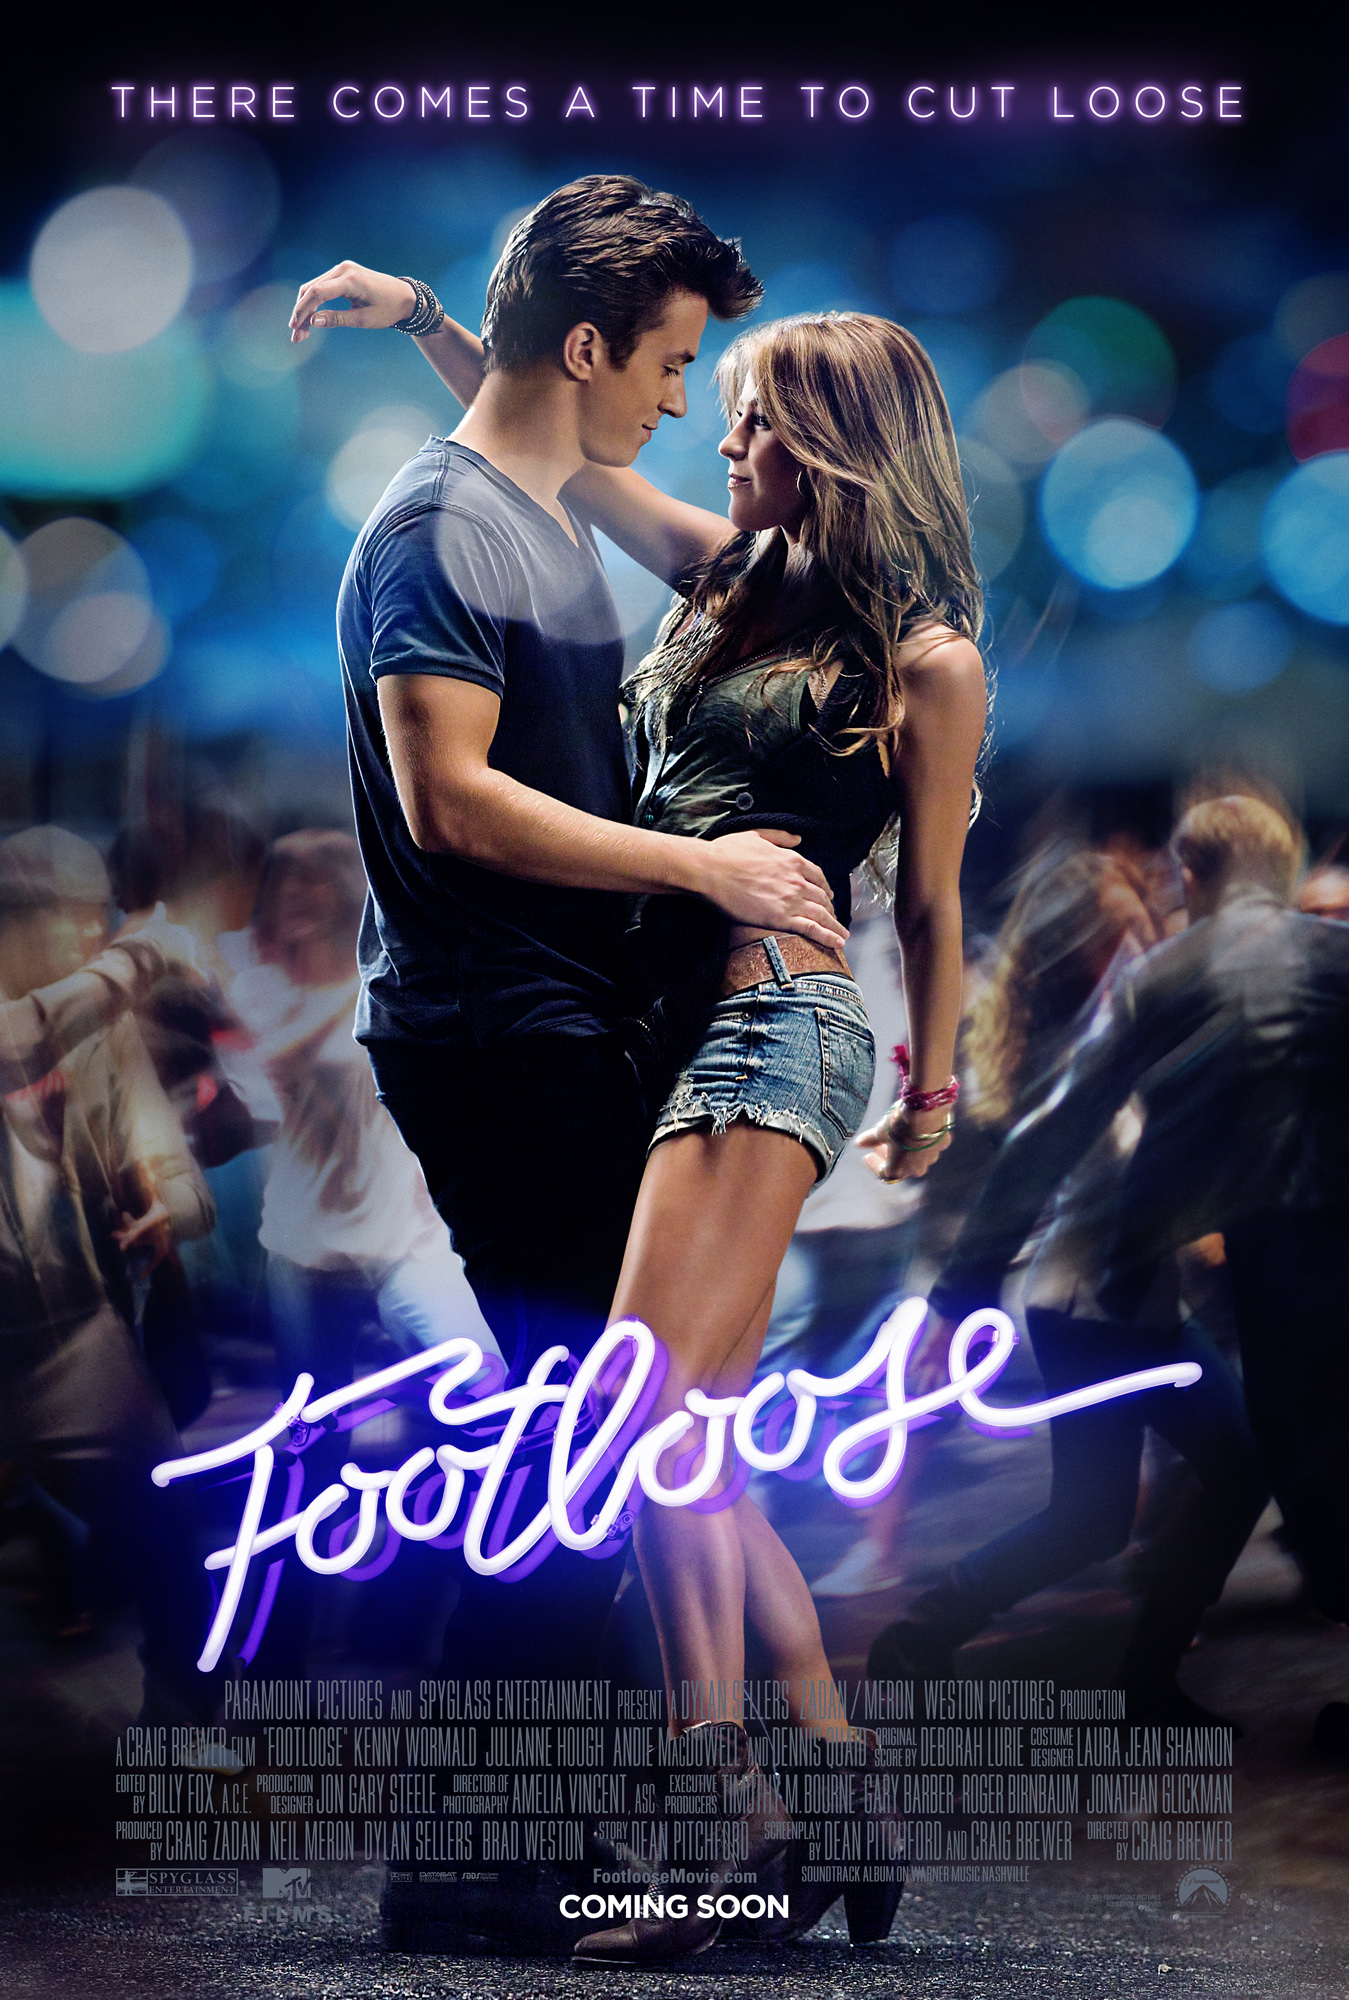 Footloose - International poster